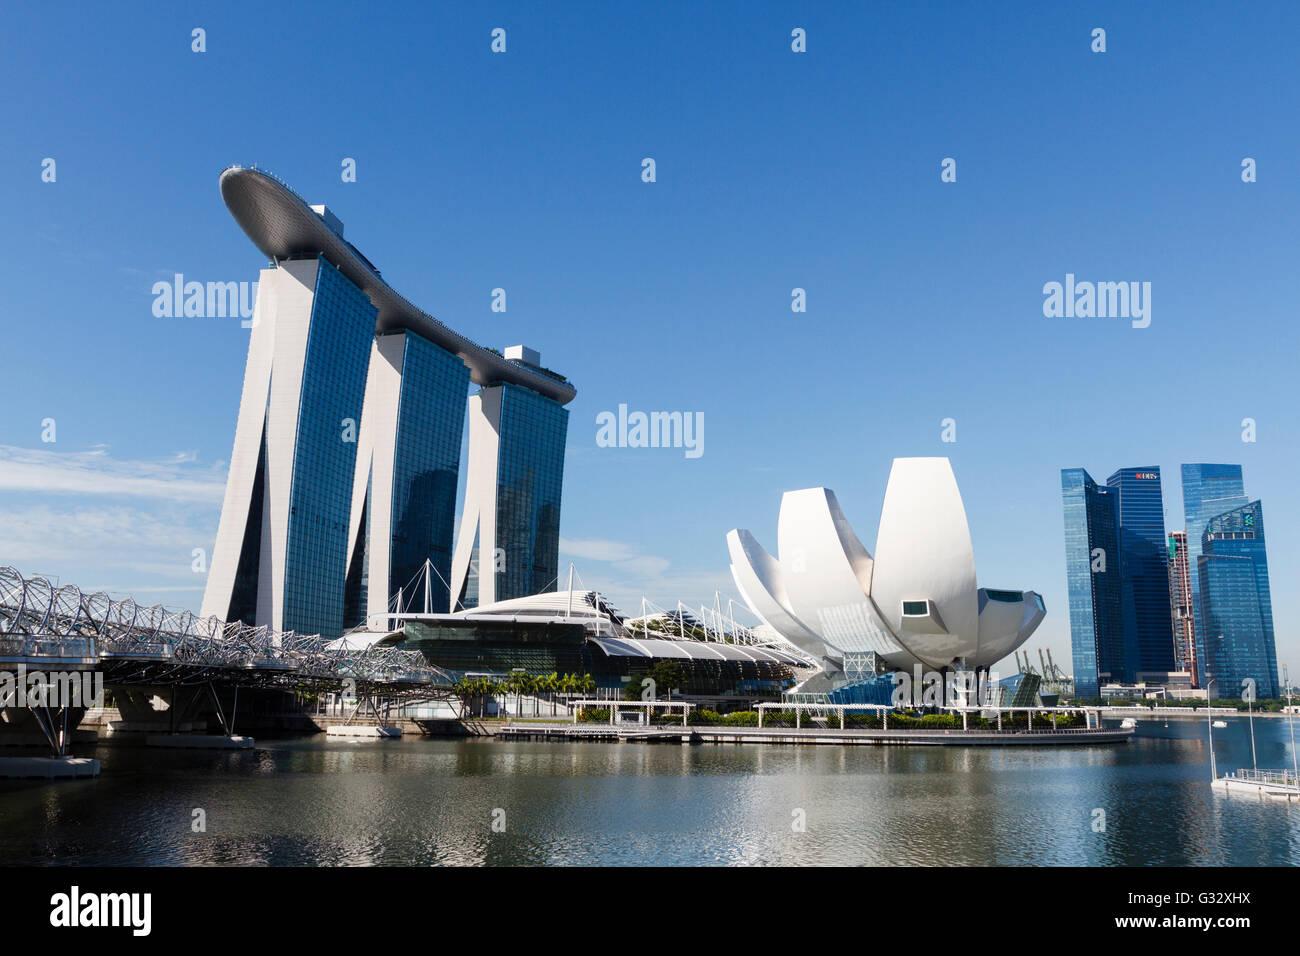 Marina Bay Sands and ArtScience Museum, Singapore - Stock Image